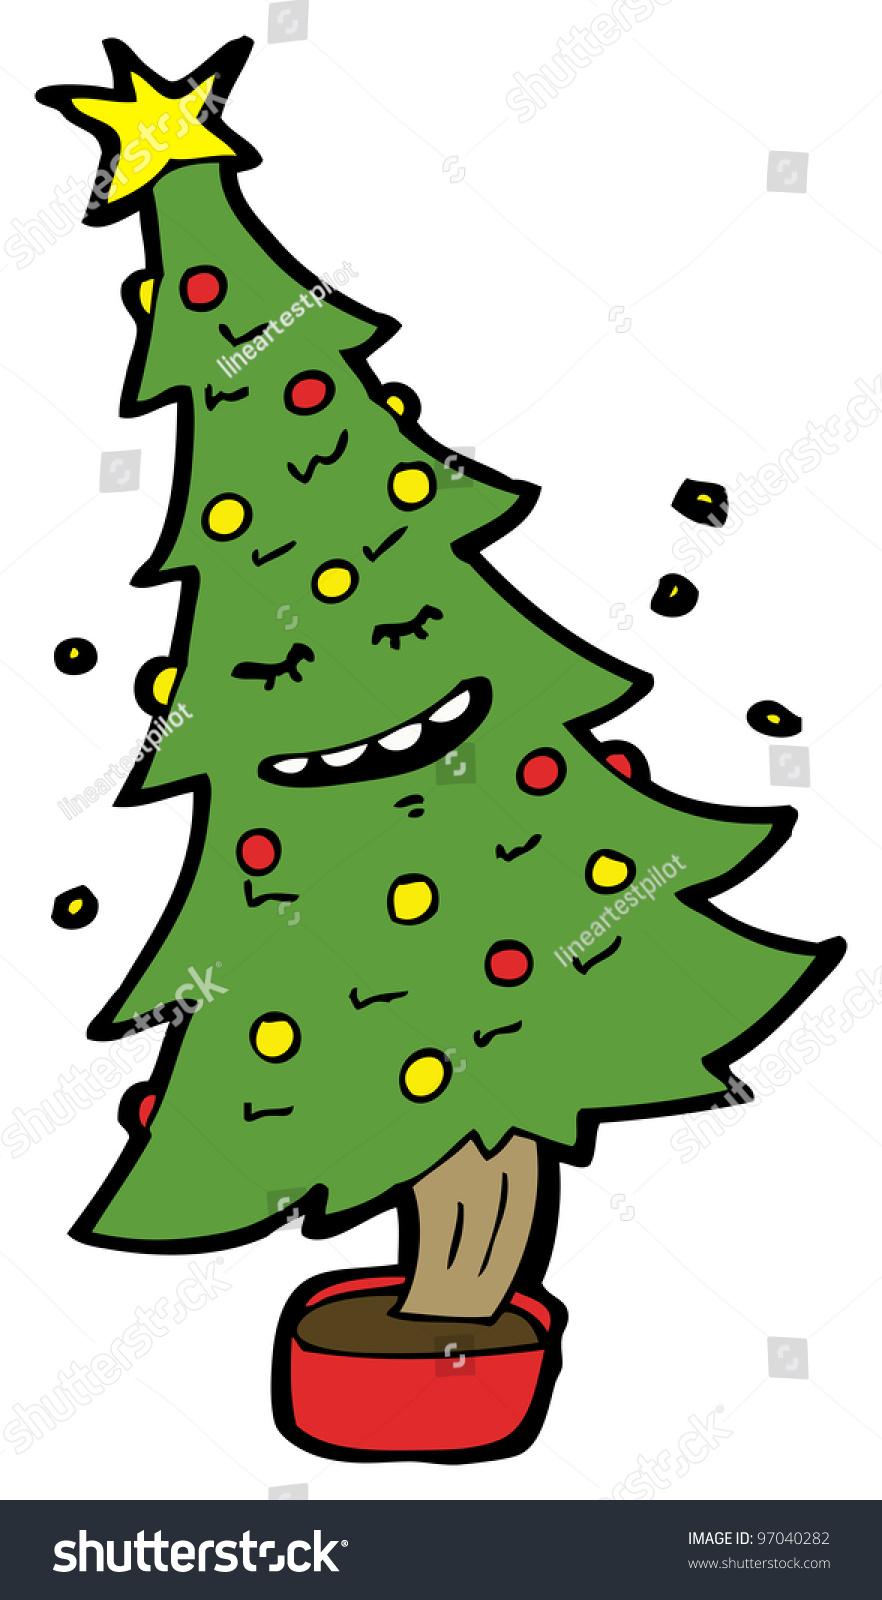 Dancing Christmas Tree Cartoon Stock Photo 97040282 ...